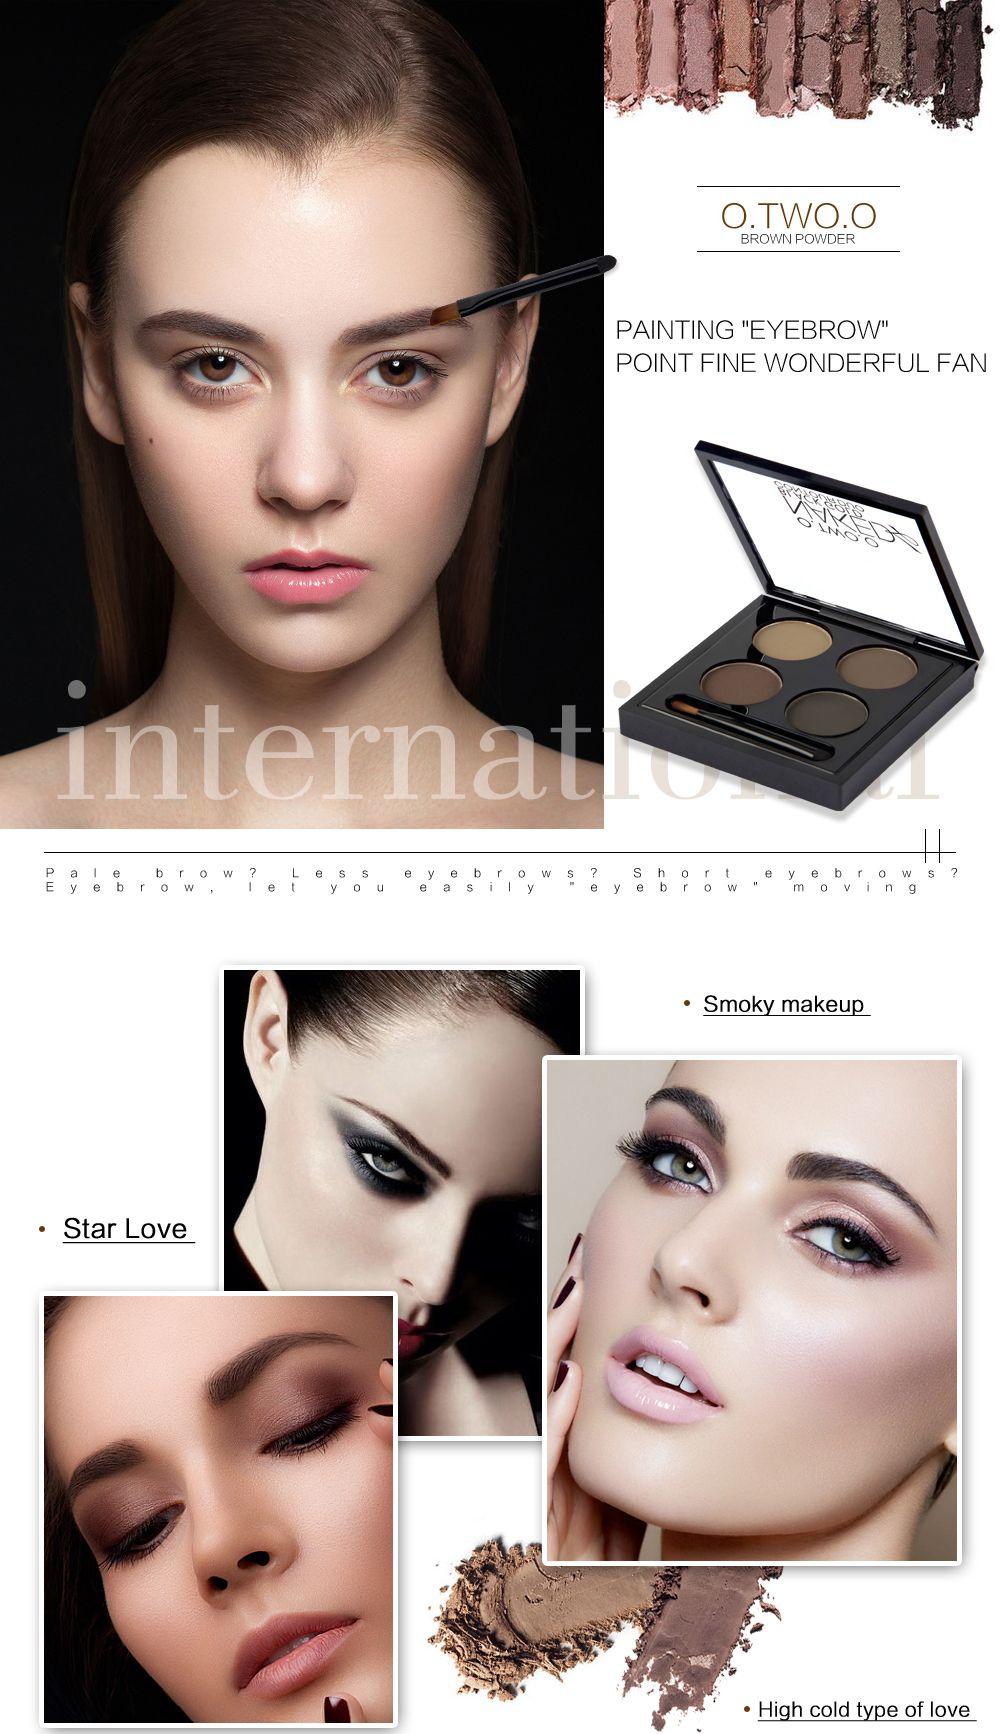 Pin by O.TWO.O Cosmetics on EYEBROW POWDER Powdered